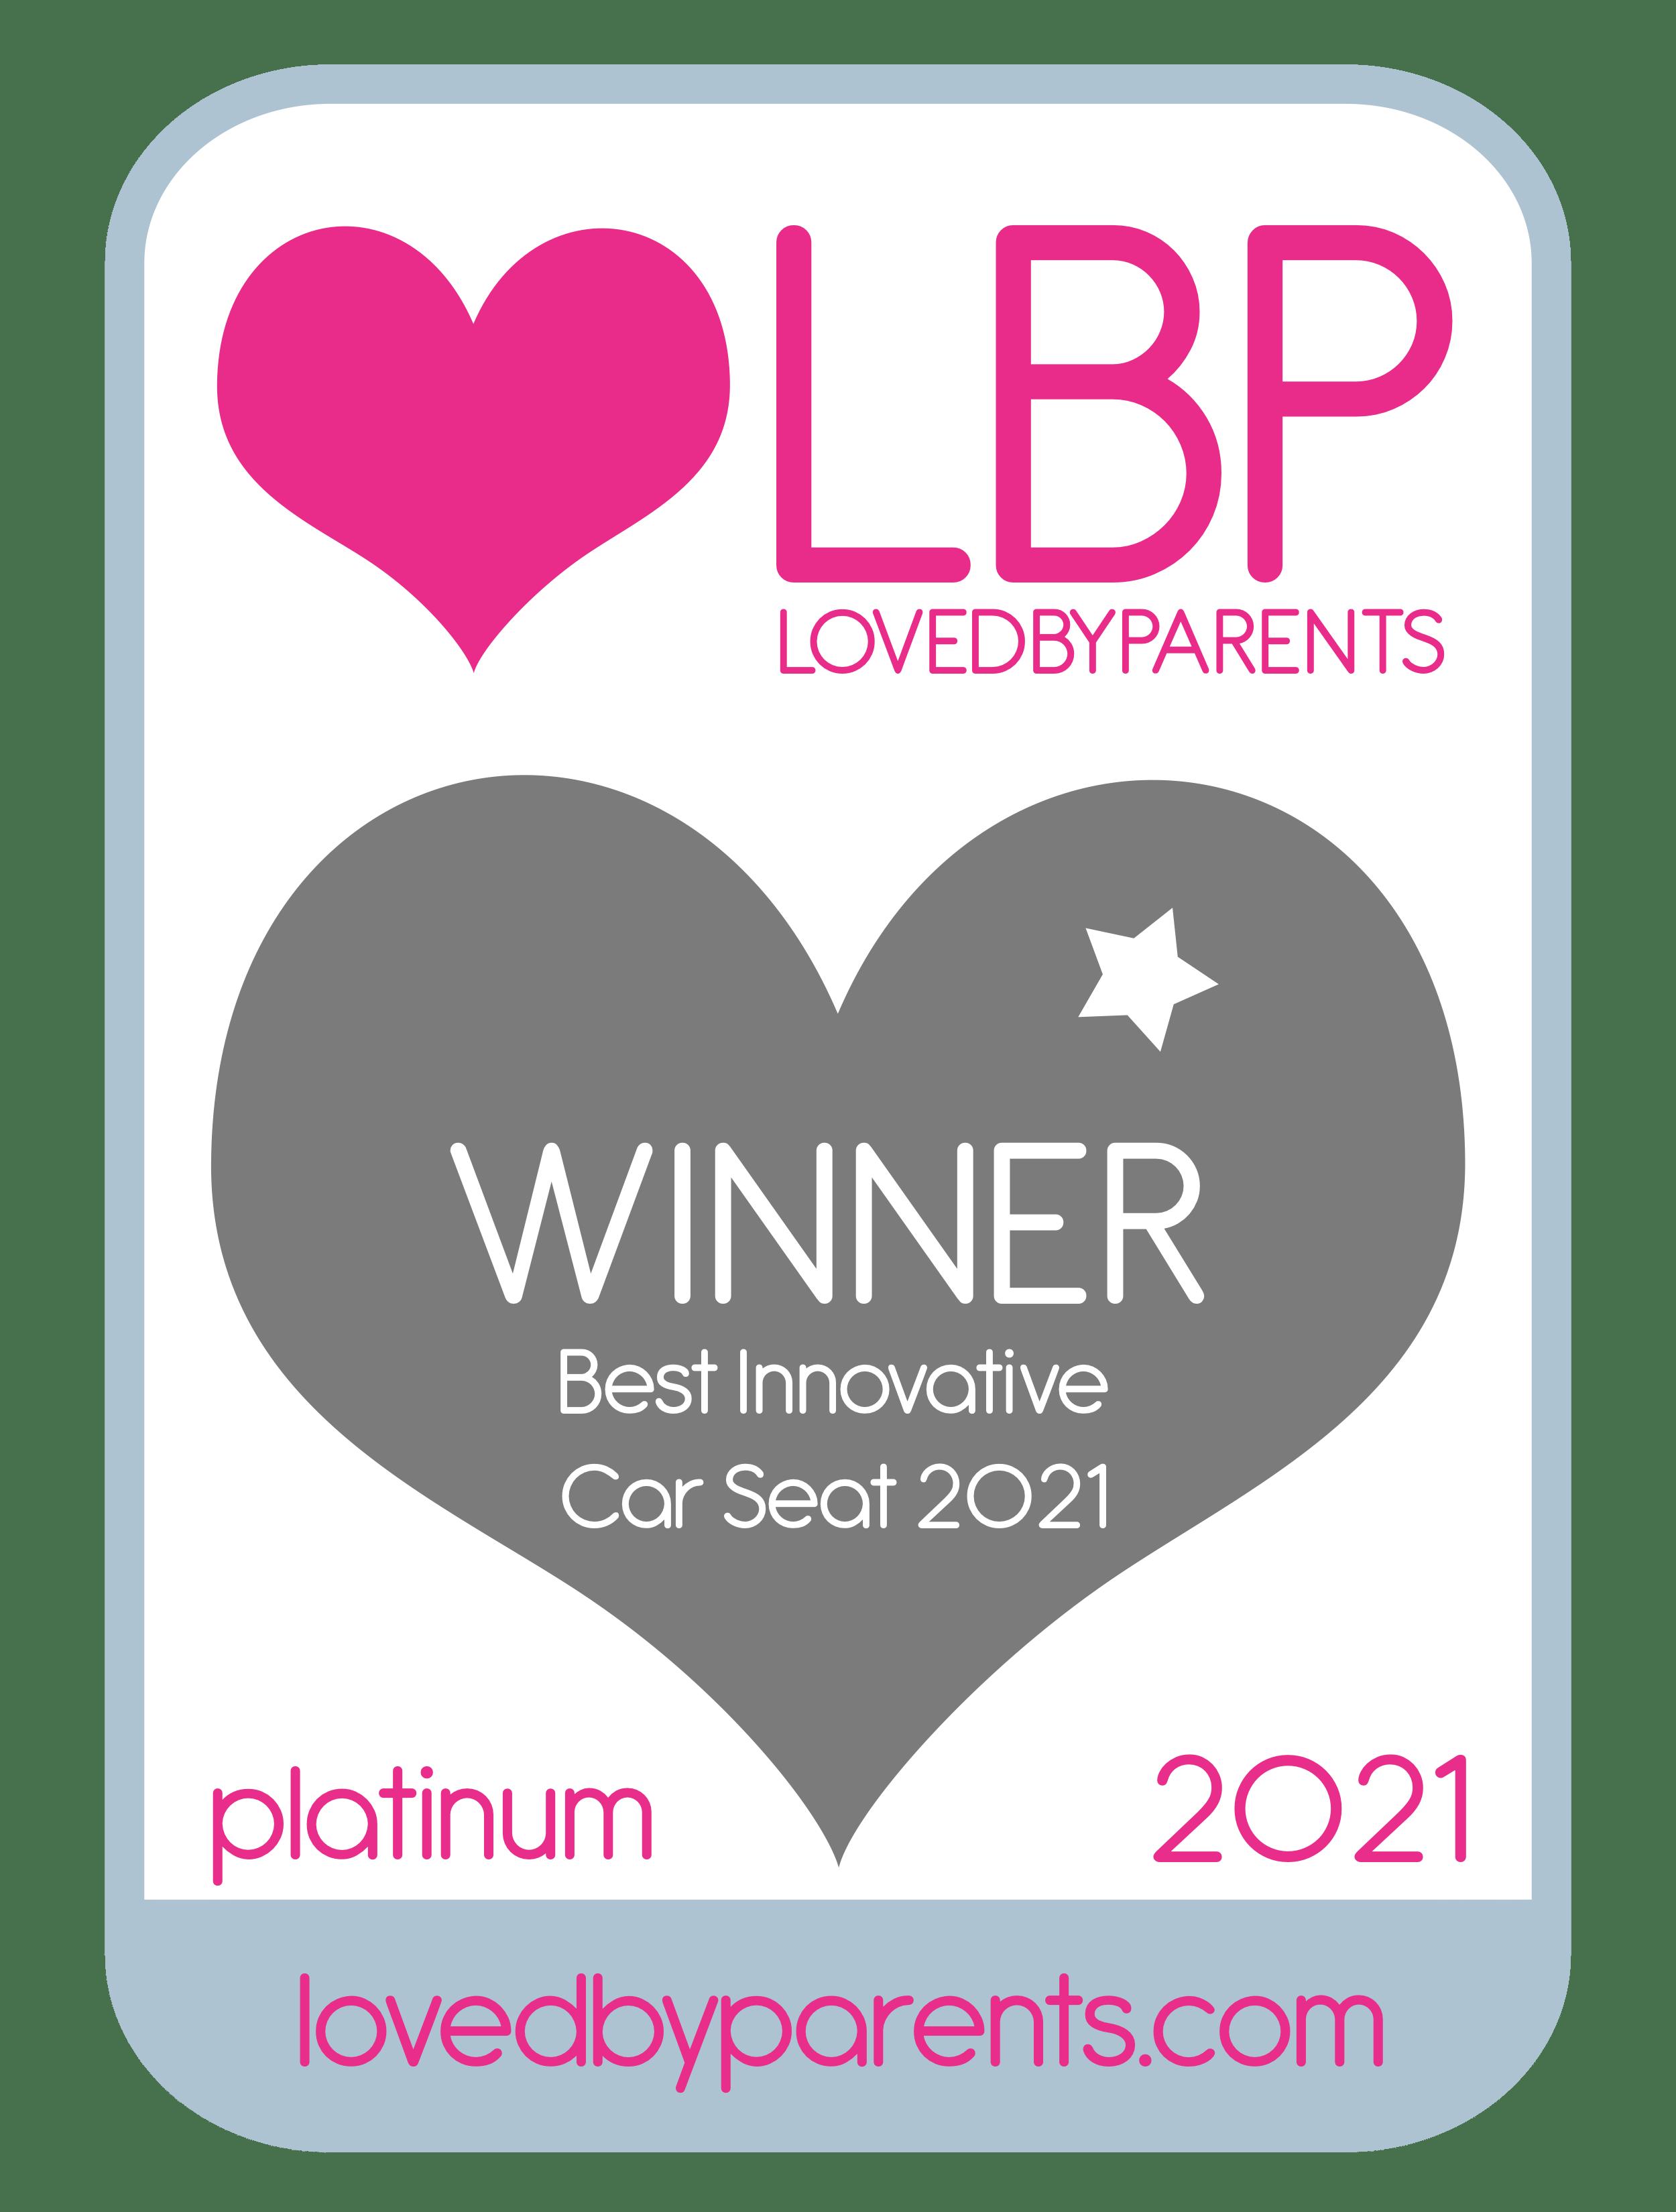 Best Innovative Car Seat 2021 – LBP